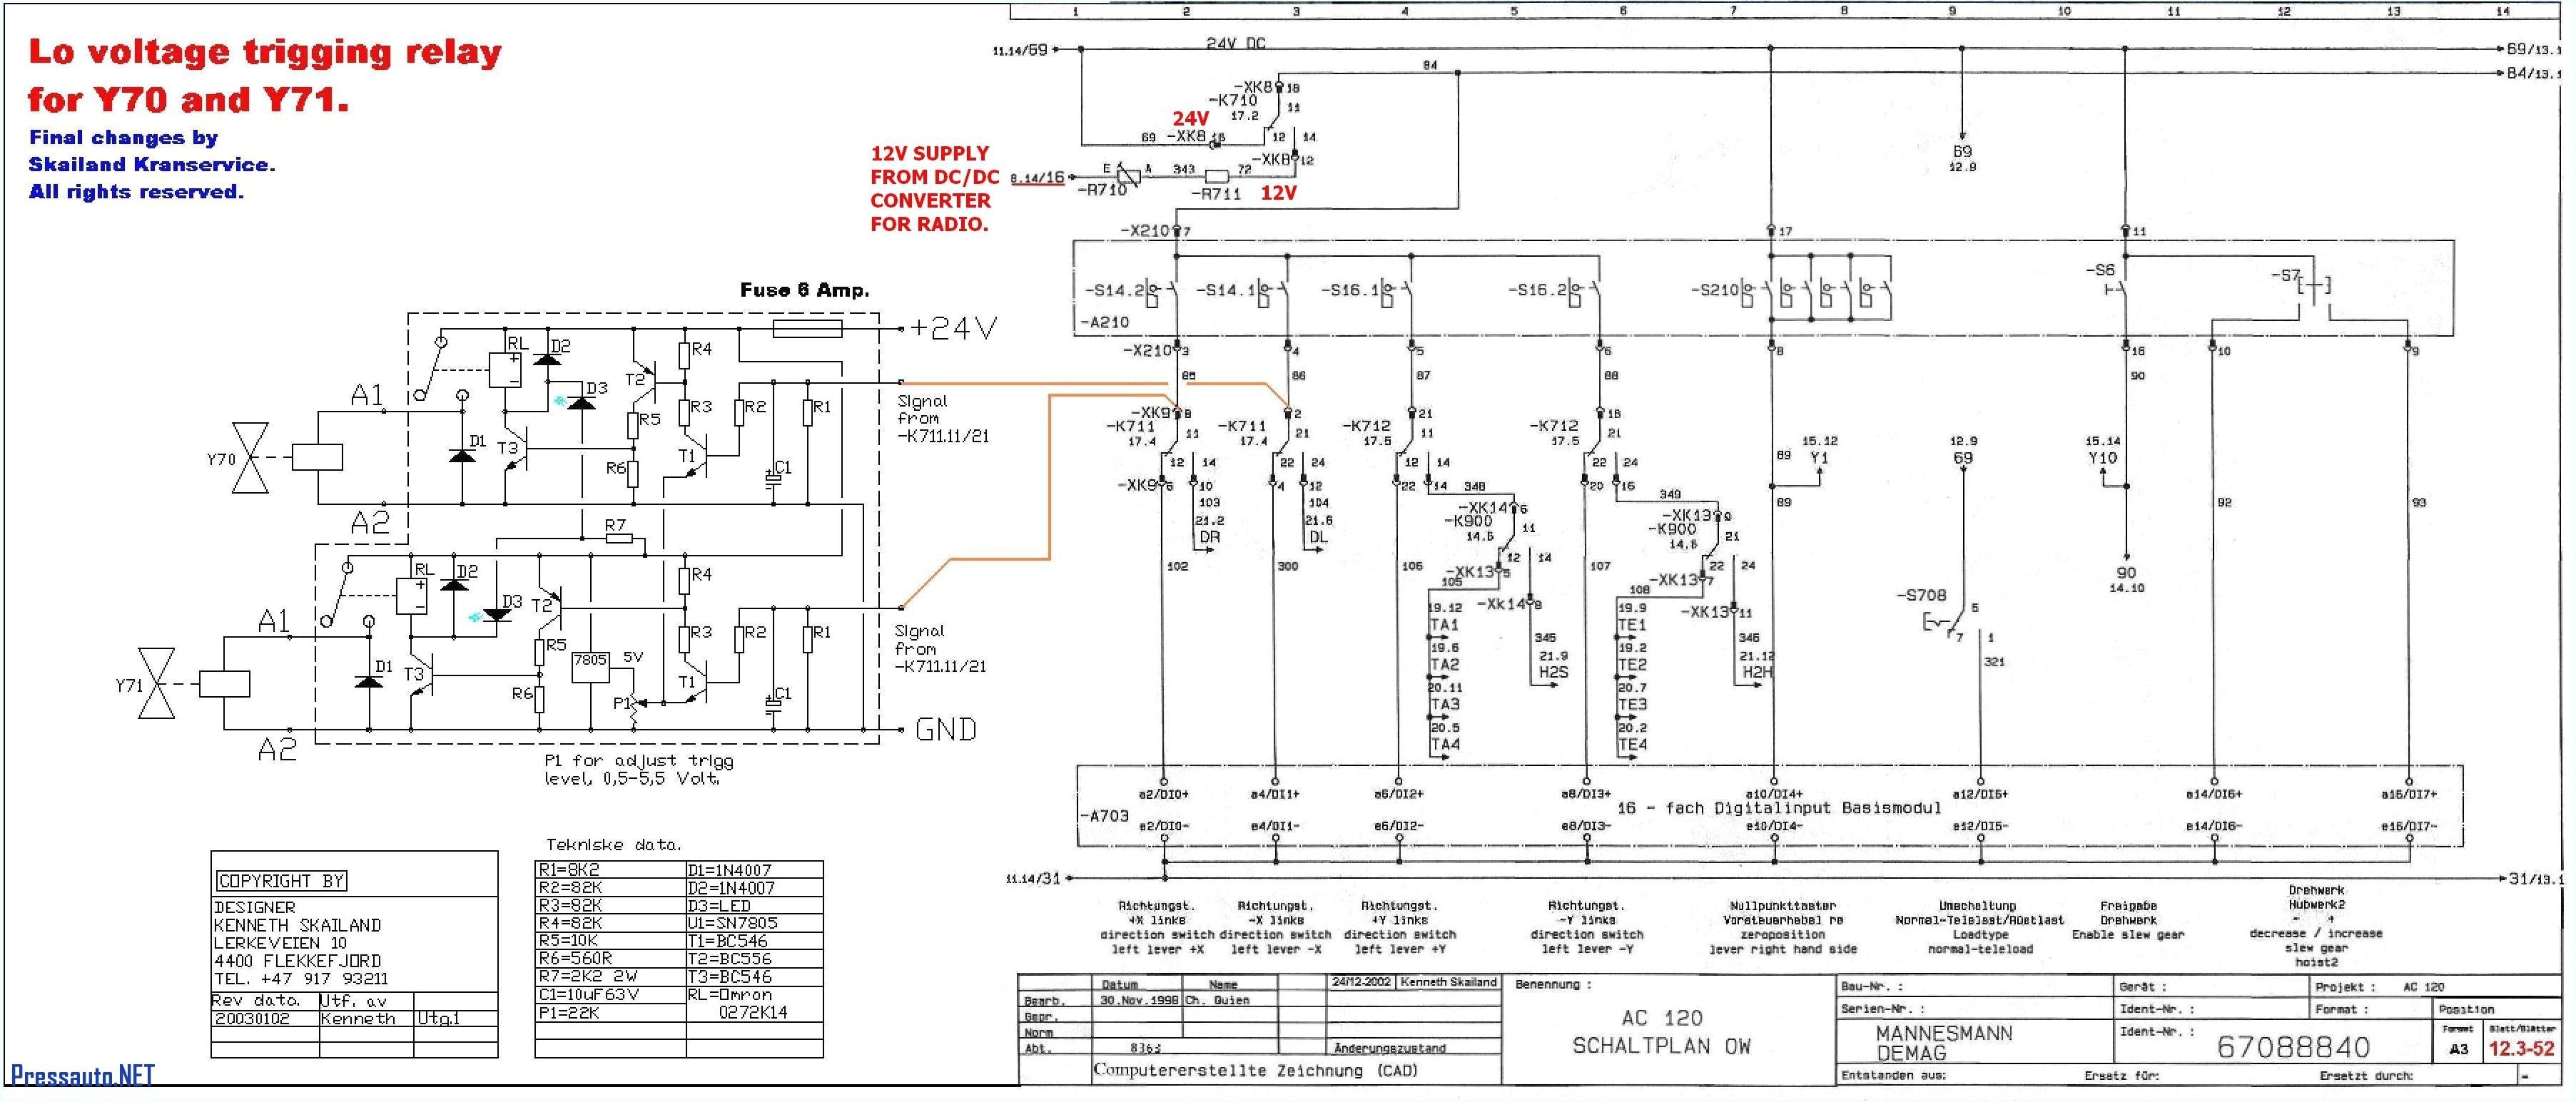 demag hoist wiring diagram inspirational abb vfd wiring diagram rh radixtheme com